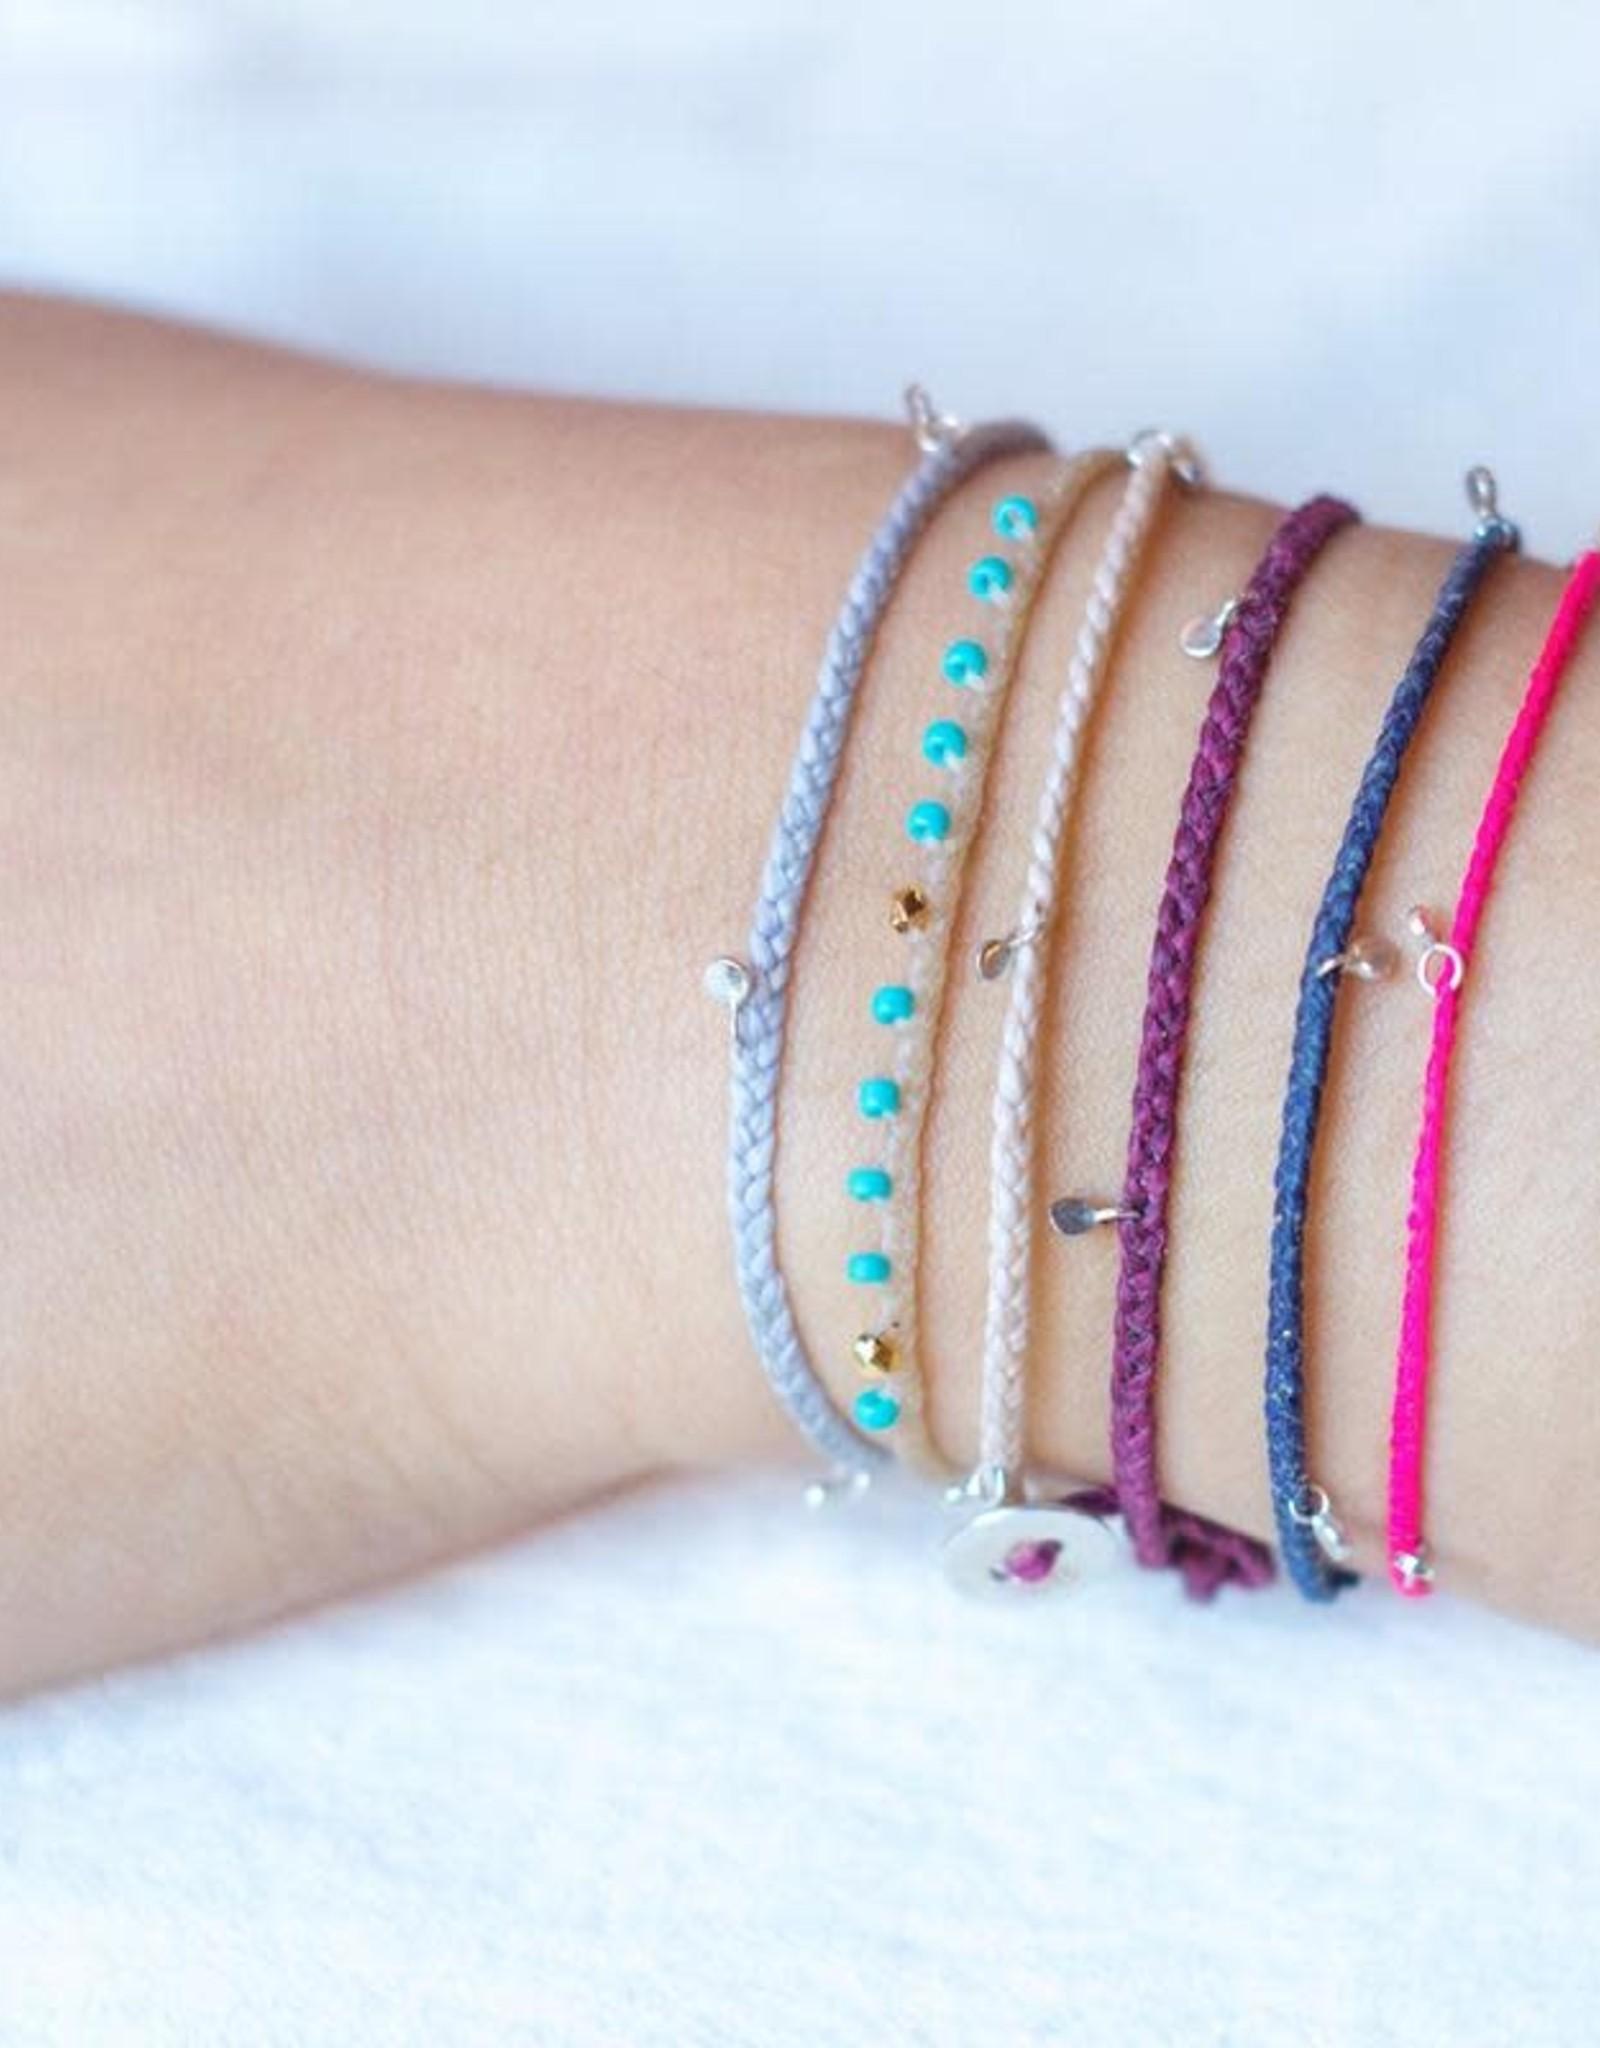 Scosha Fairy Bead Vermeil Bracelet - Lavender